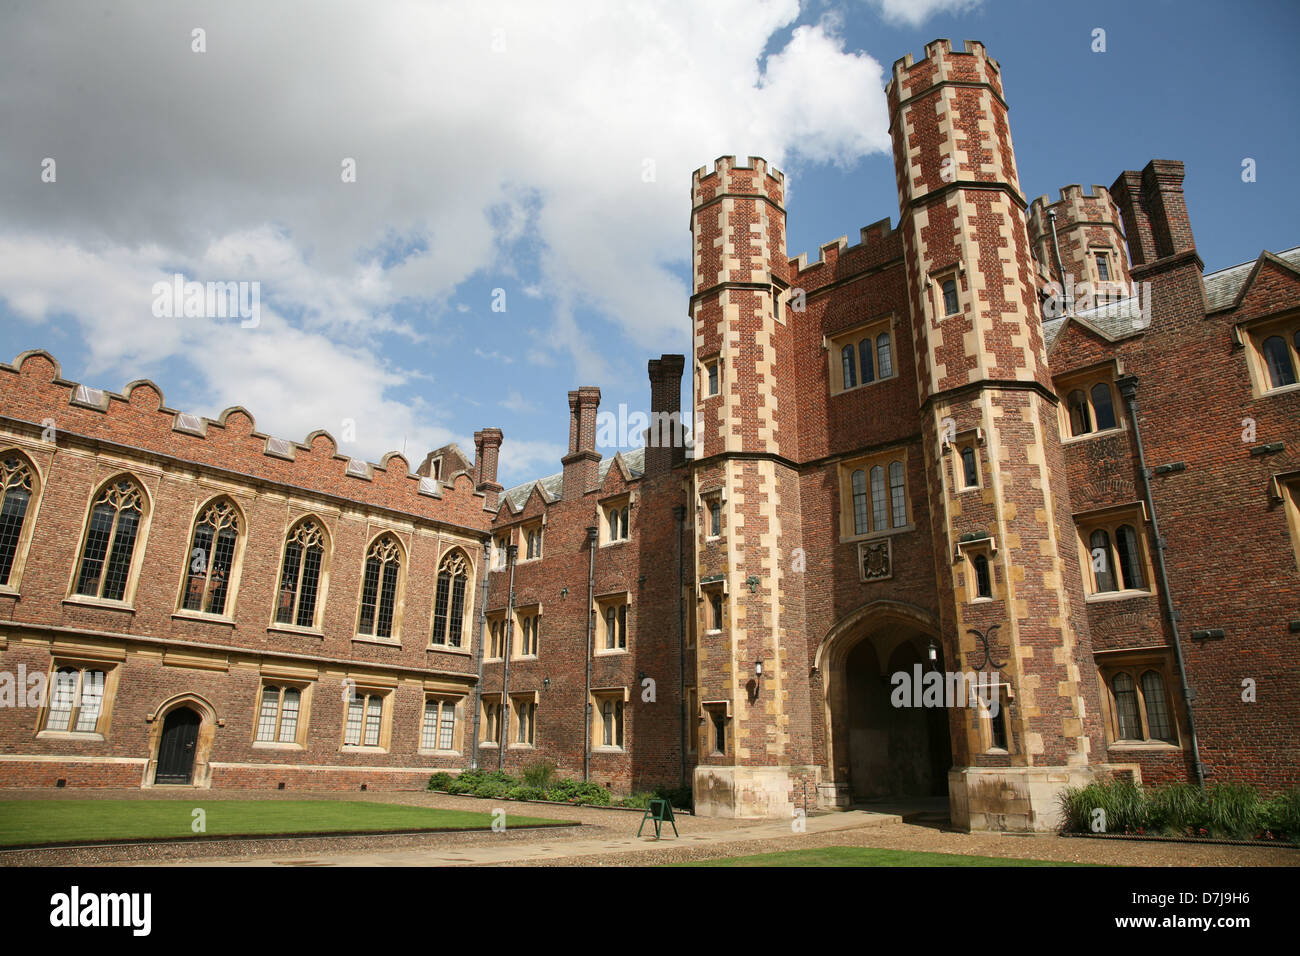 St. John's College Cambridge University England - Stock Image